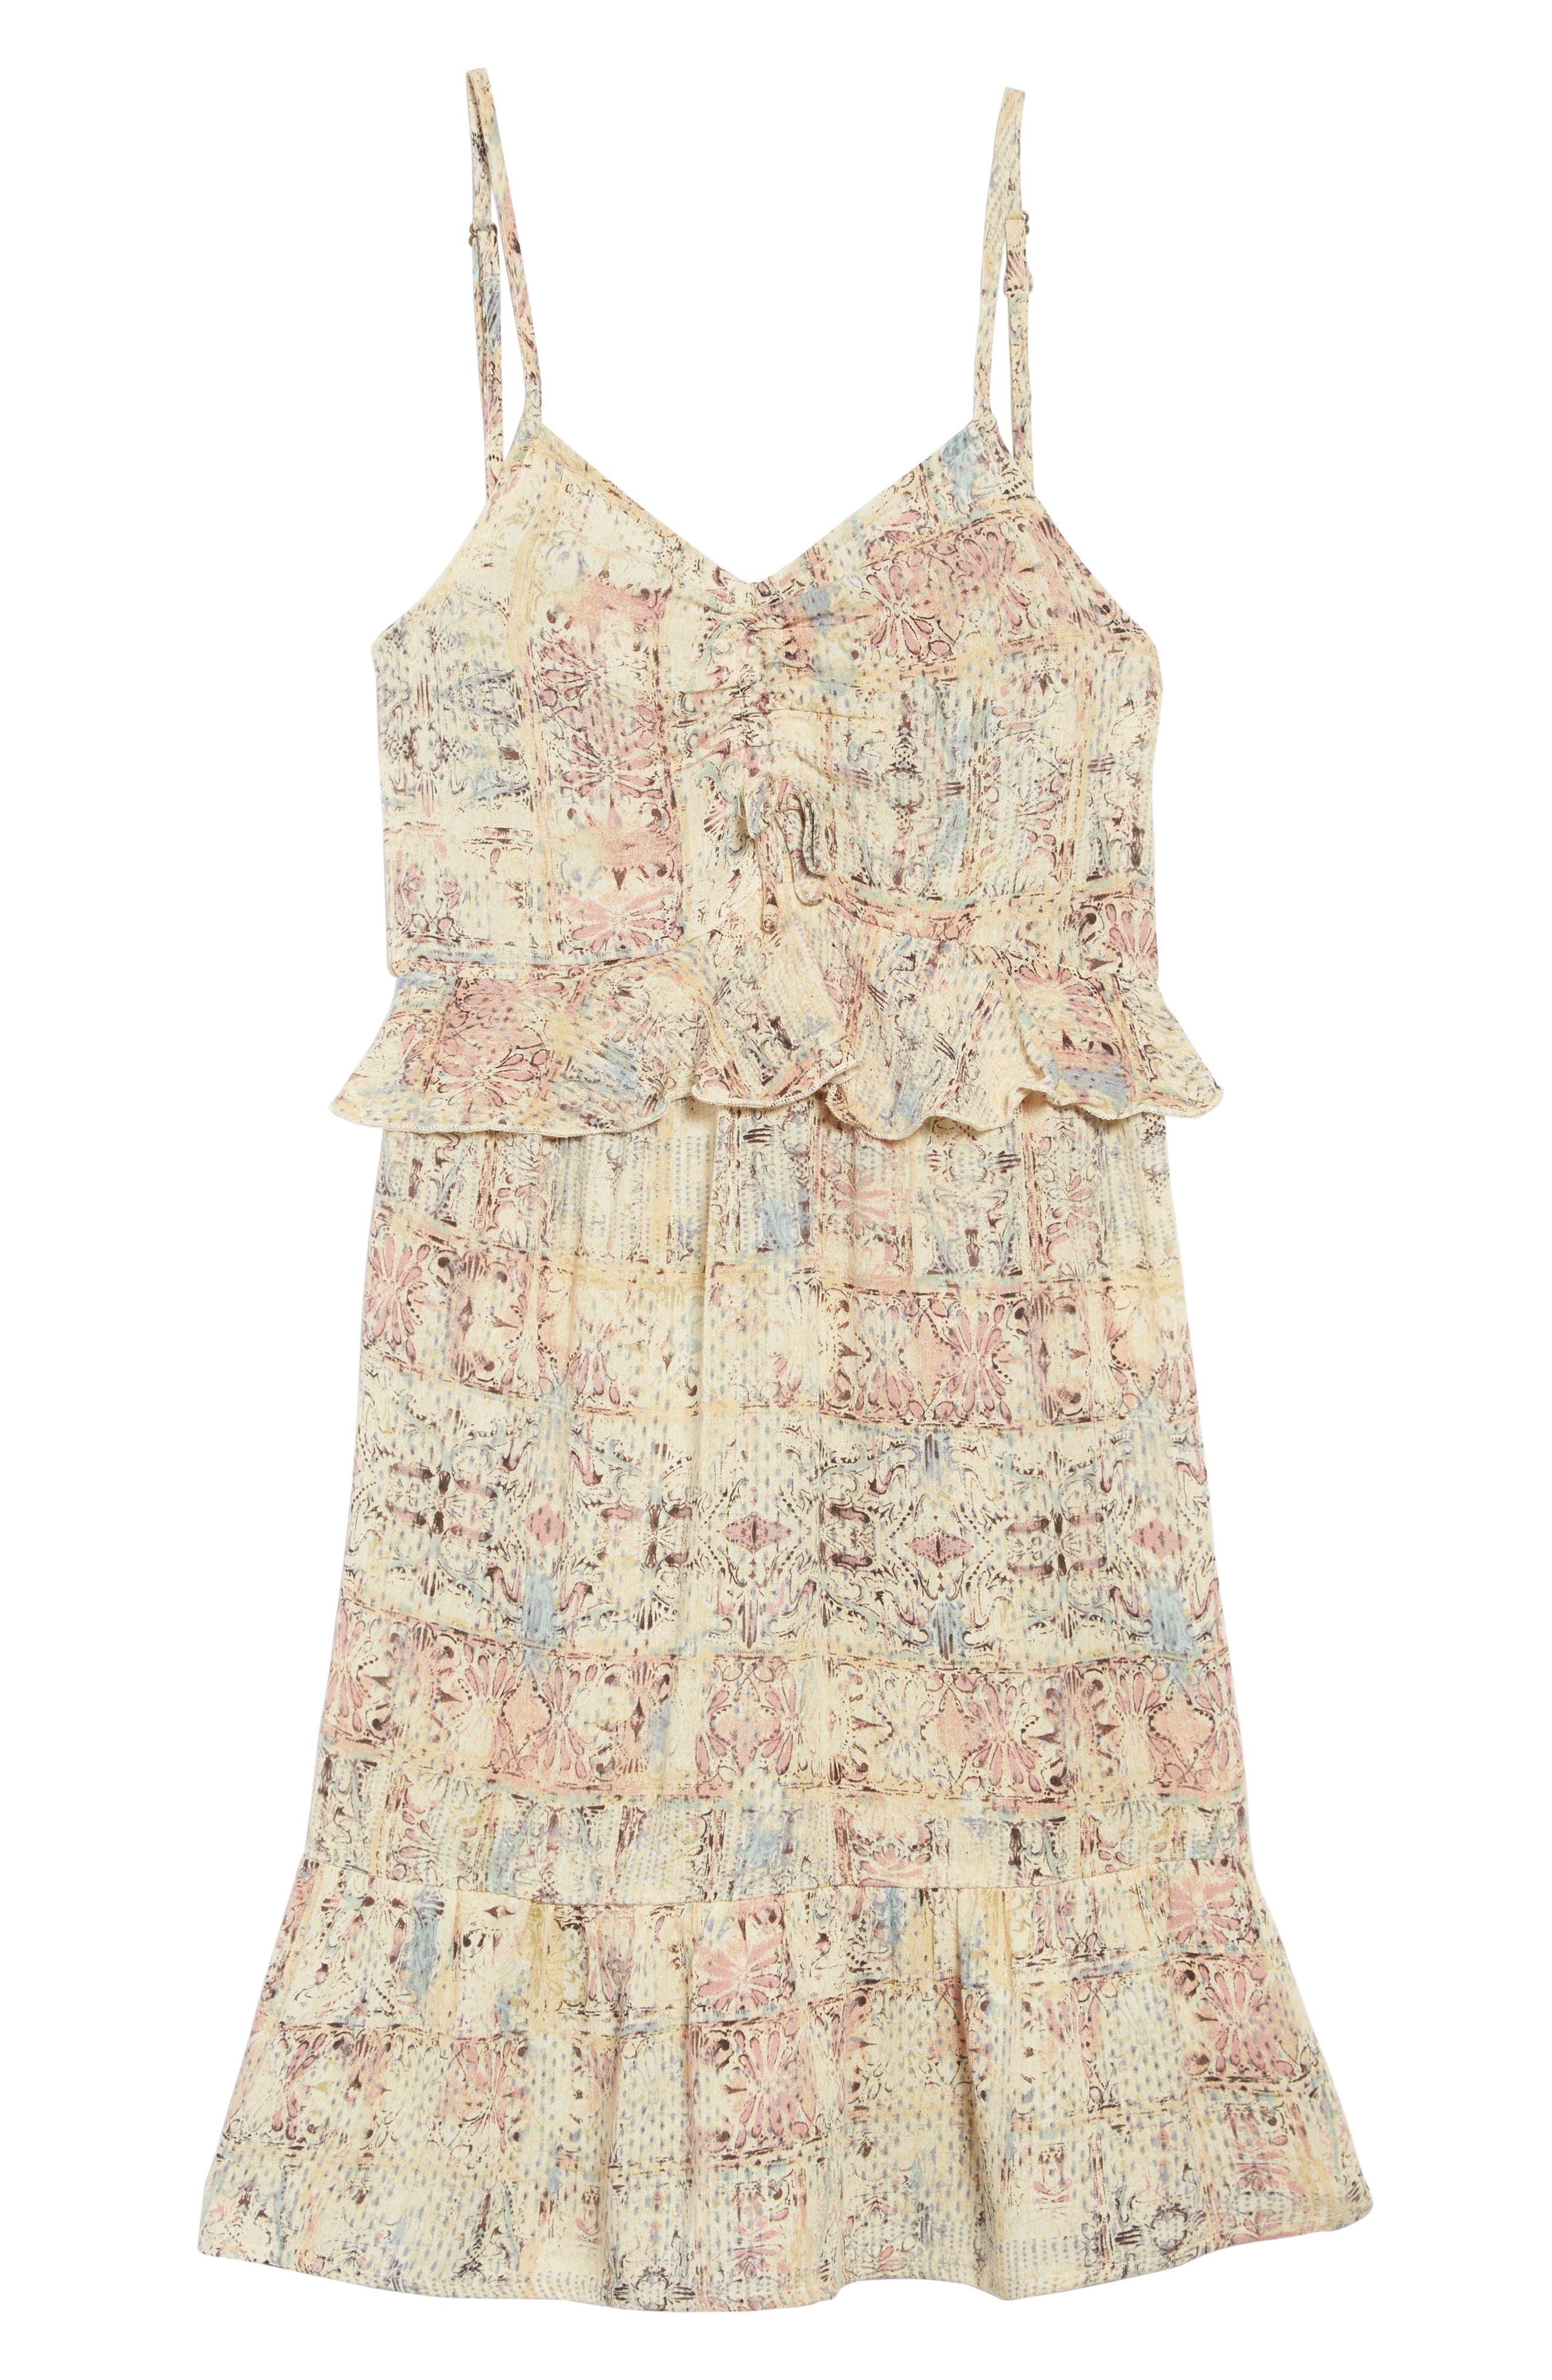 Lithia Peplum High/Low Dress,                             Main thumbnail 1, color,                             MULTI COLORED